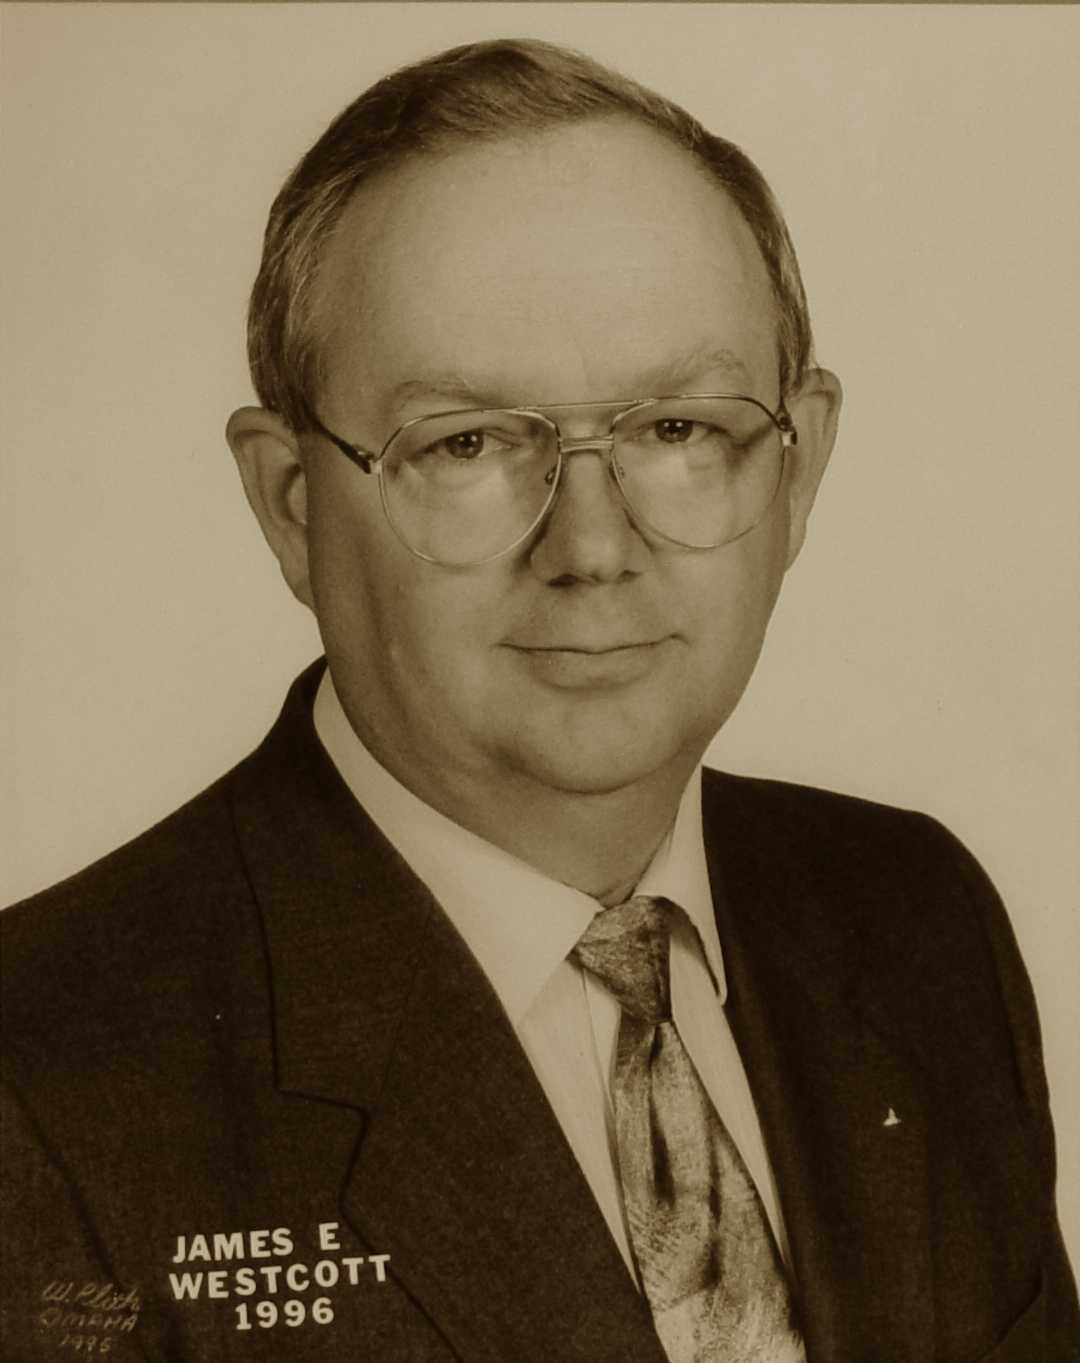 James E. Westcott, 1996